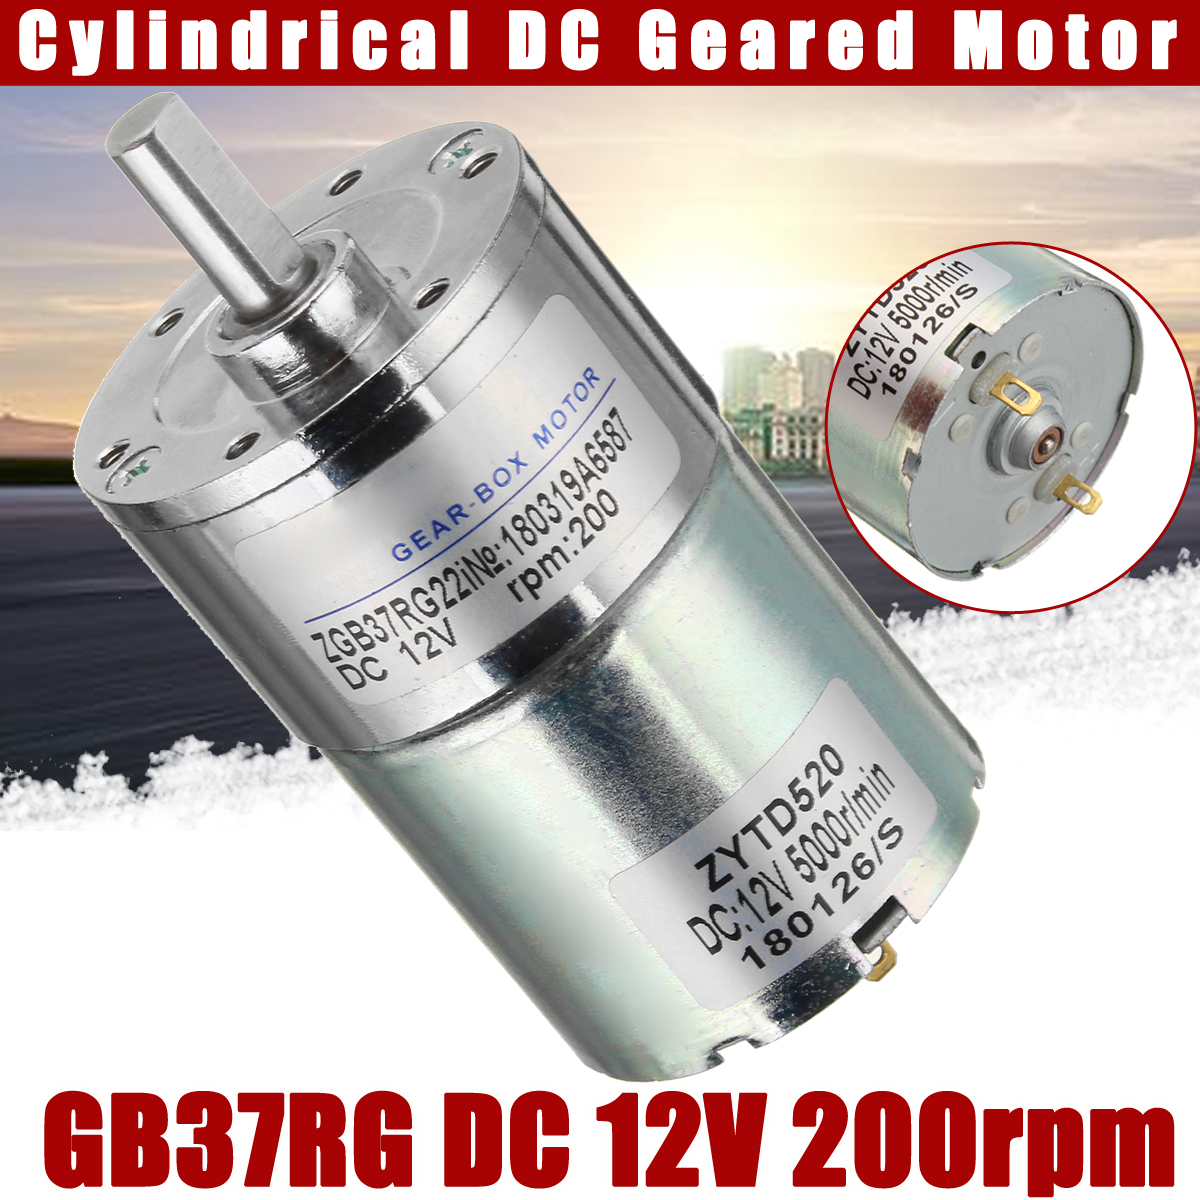 DC 12V 200rpm 1500 6mm Shaft Dia Cylindrical Permanent Magnet DC Gear Reduction Motor Rated DIY Robot ZGB37RG Adjustable